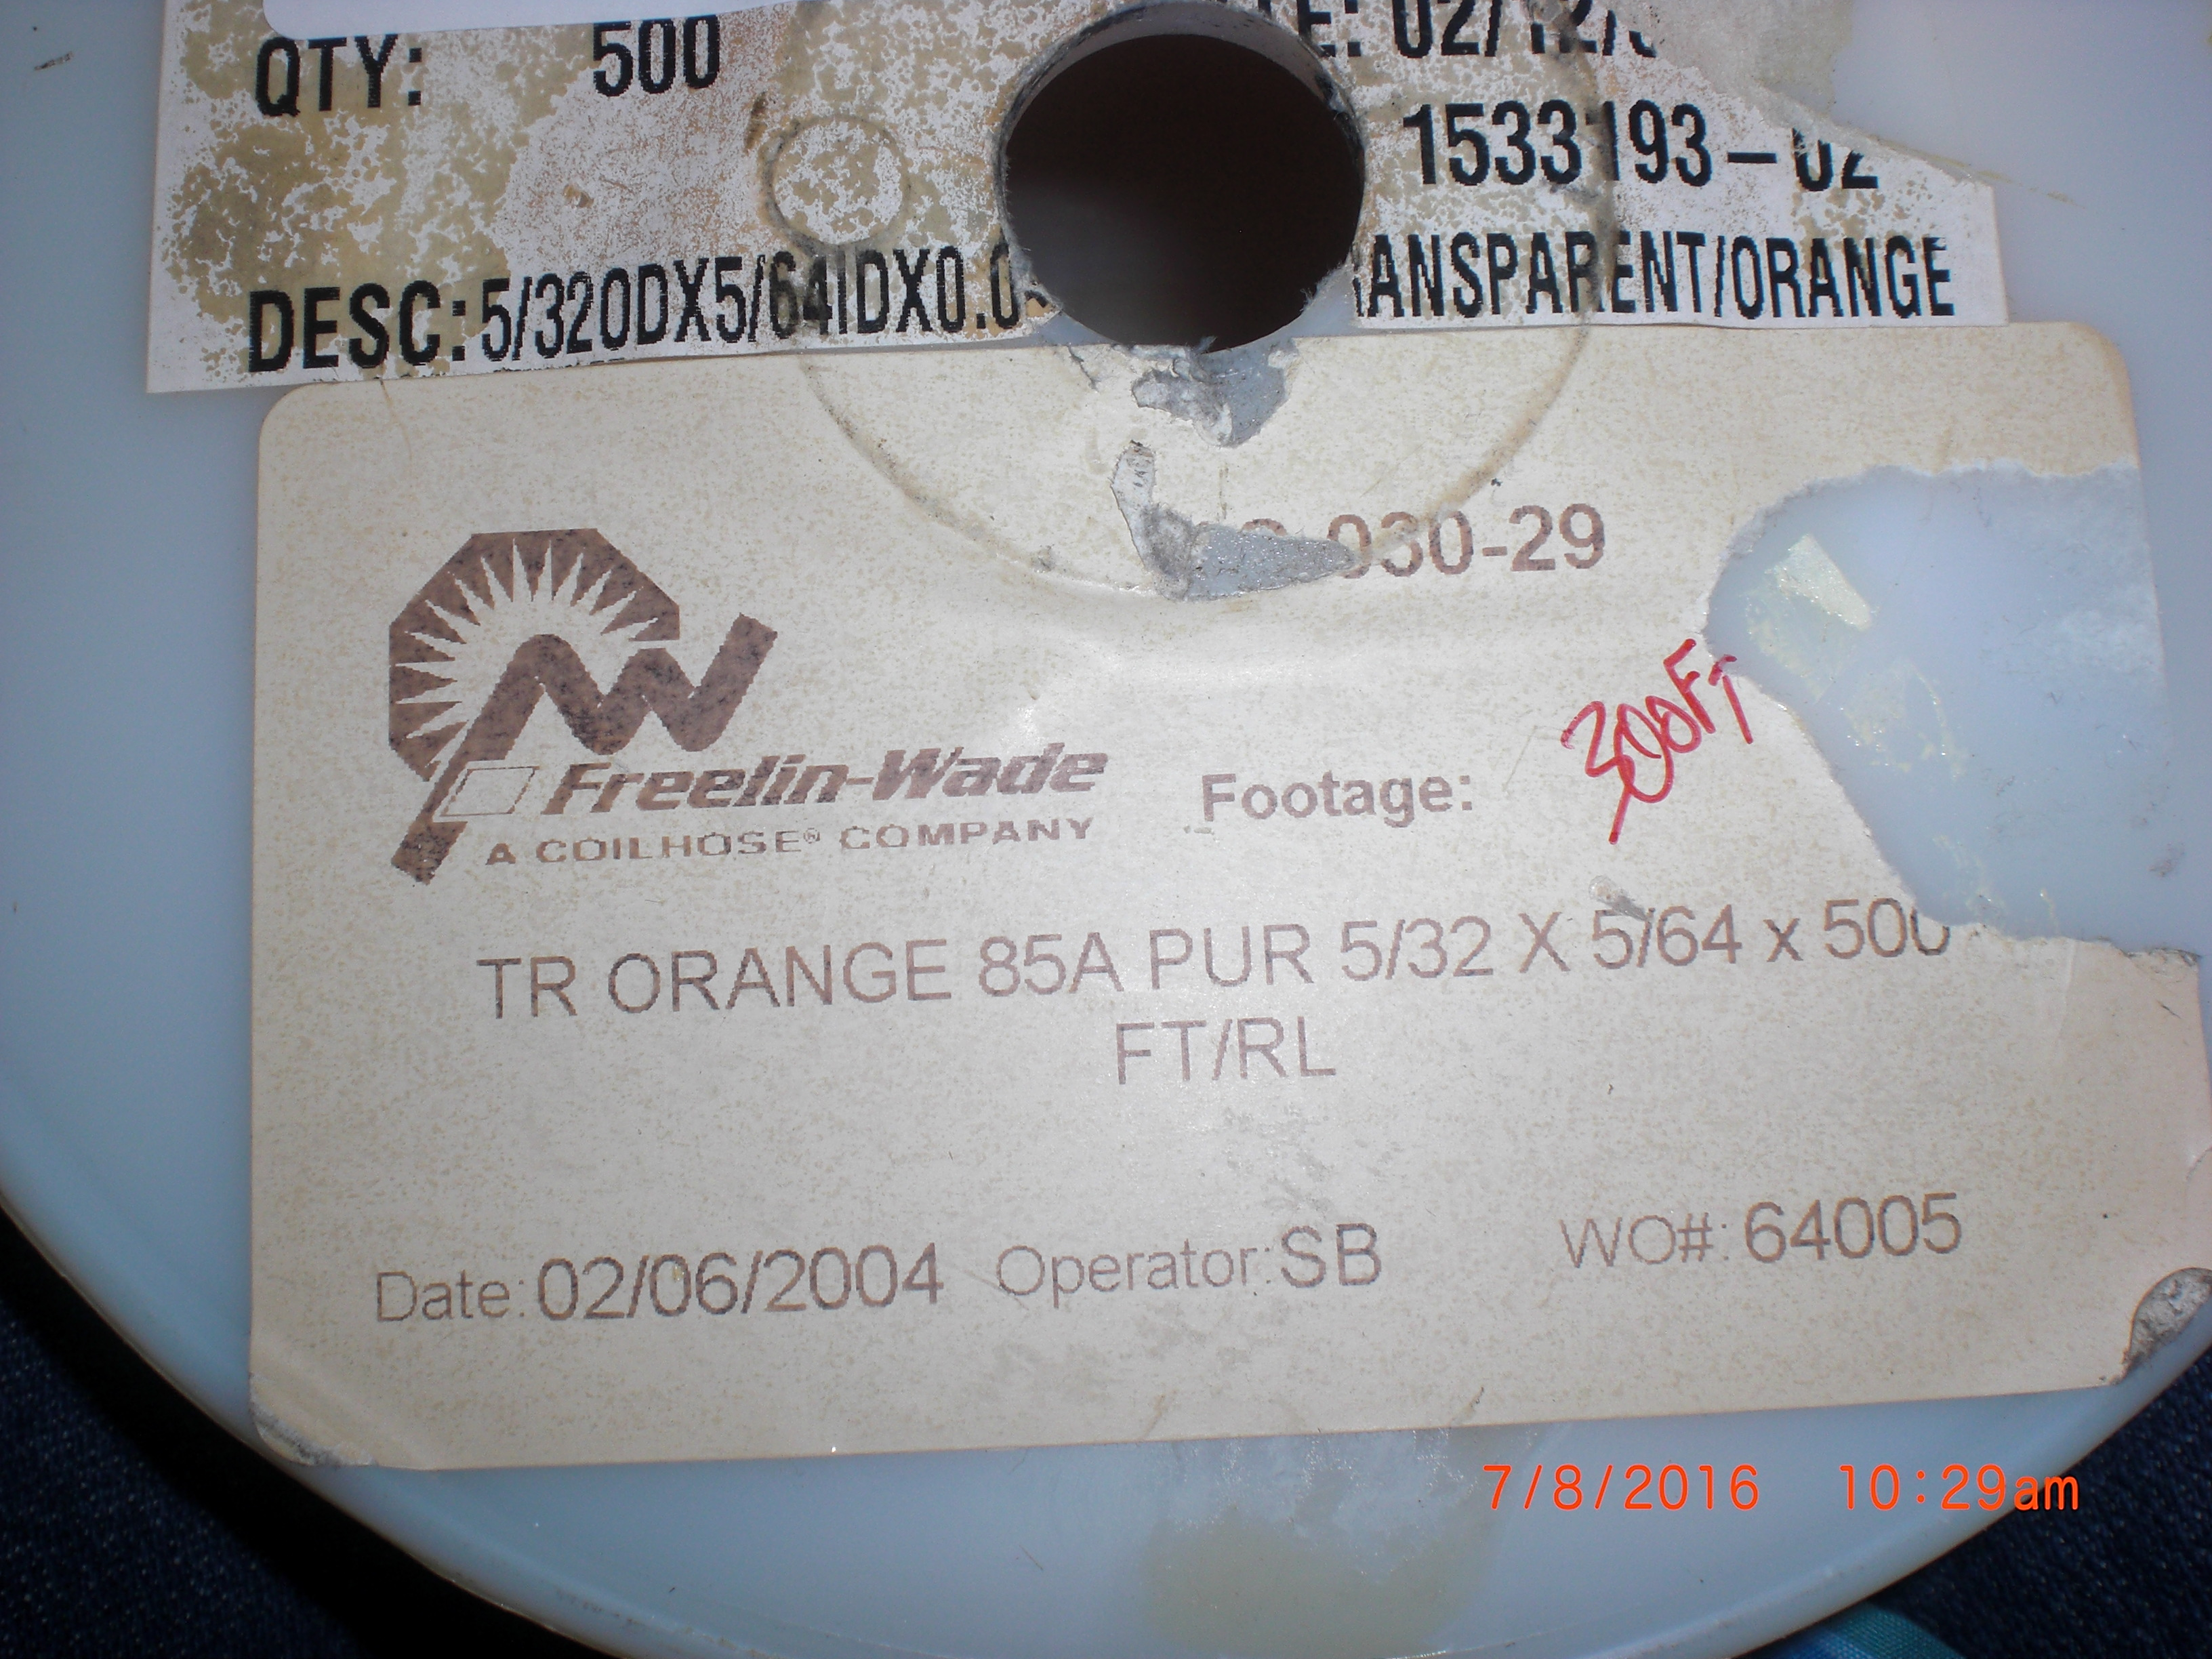 Tubing 300ft TR Orange Polyurethane  85A PUR 5/32 x 5/64 FREELIN-WADE 1C-030-29